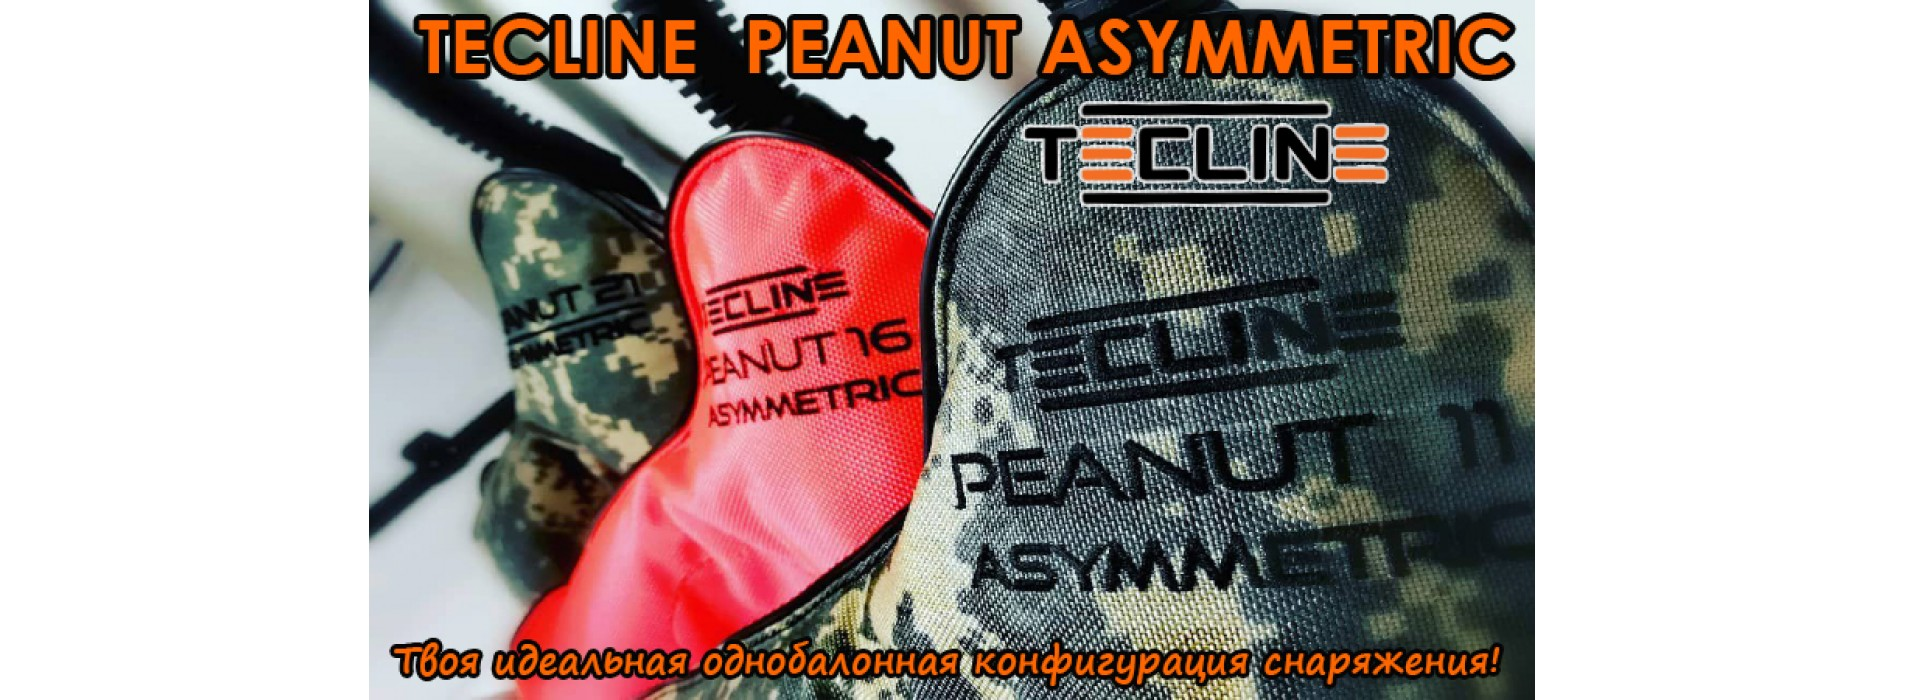 КРЫЛО TECLINE PEANUT ASYMMETRIC